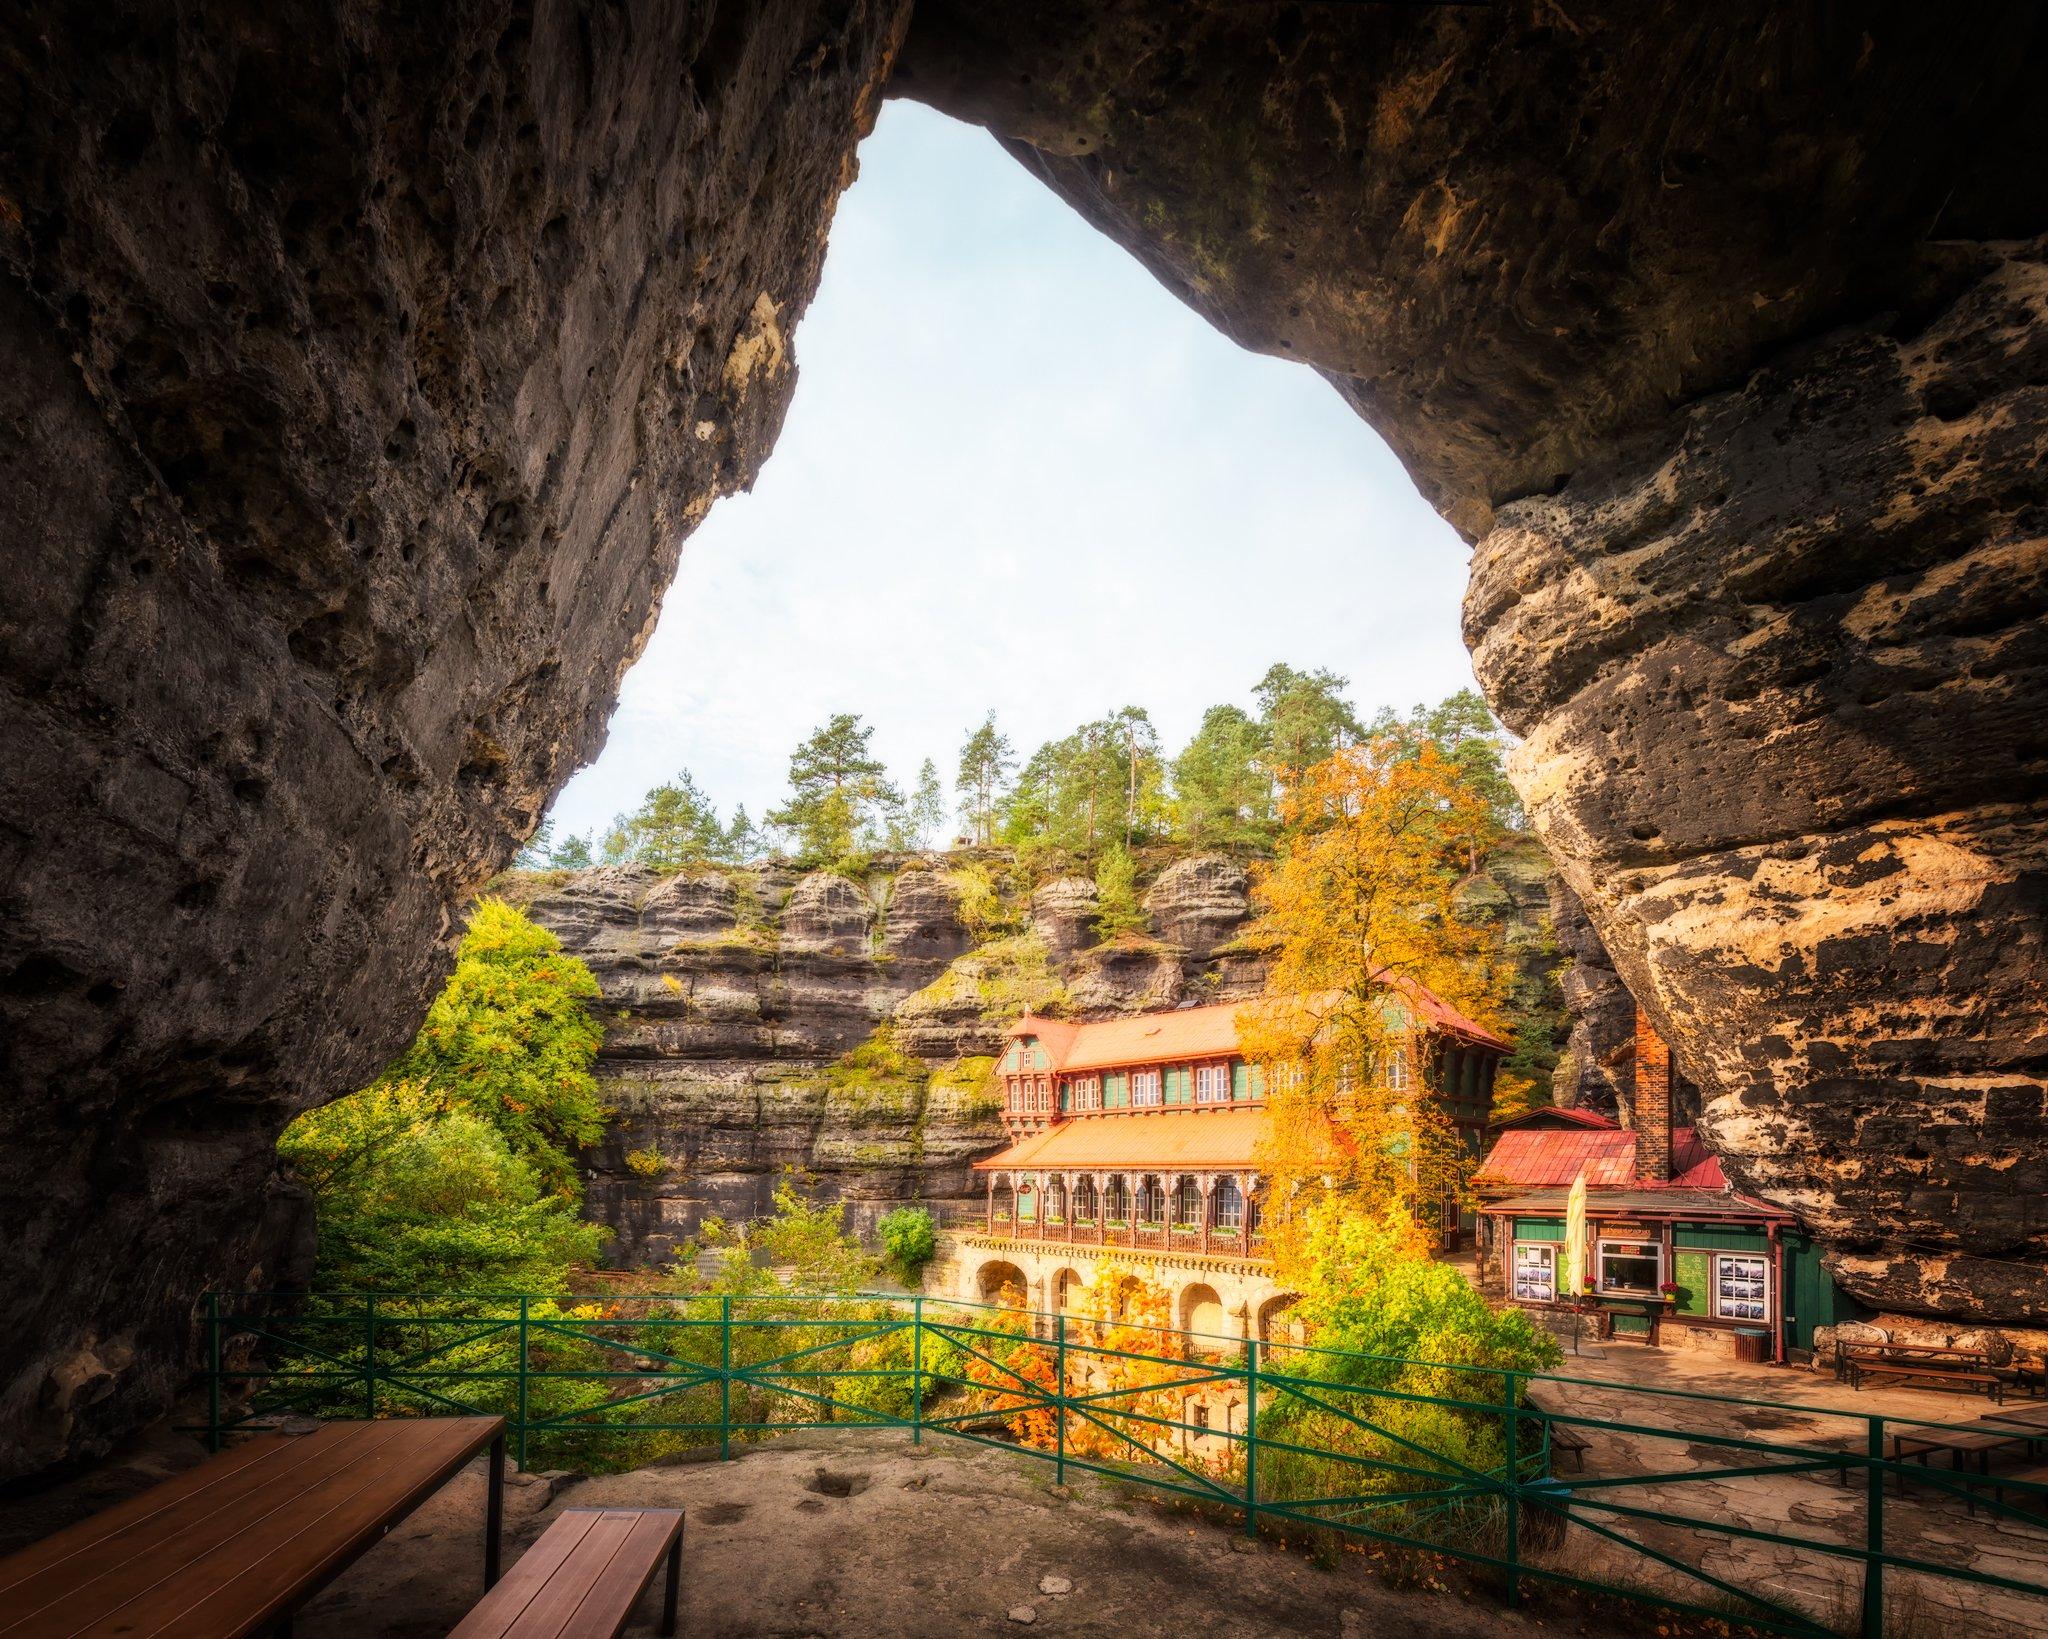 Pravčická Sandstone Gate and The Falcon's Nest in Bohemia; Czech Republic